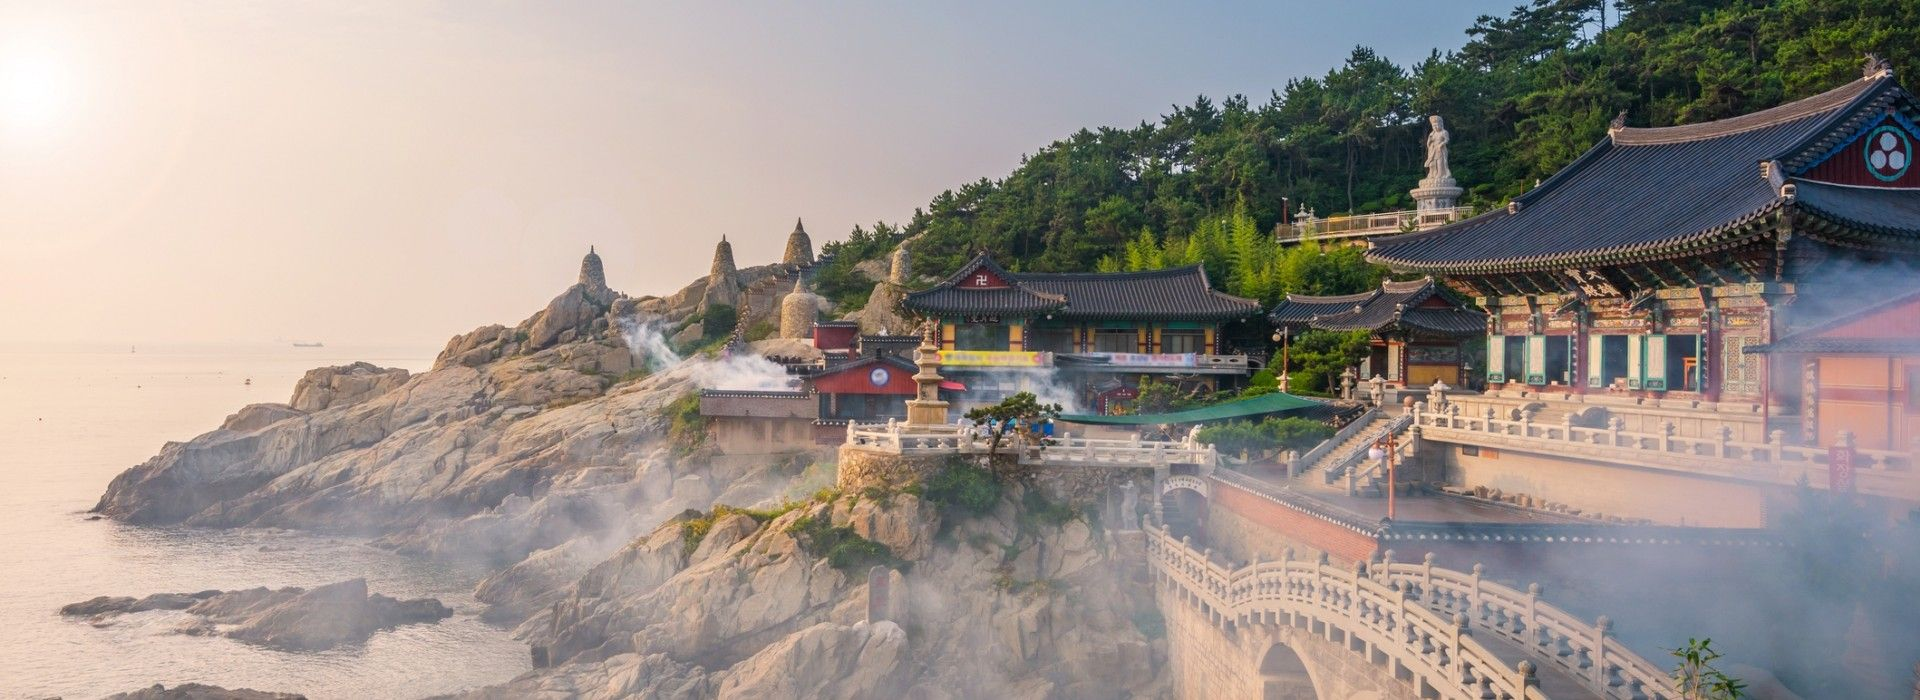 Art and architecture Tours in Jeonju Hanok Village